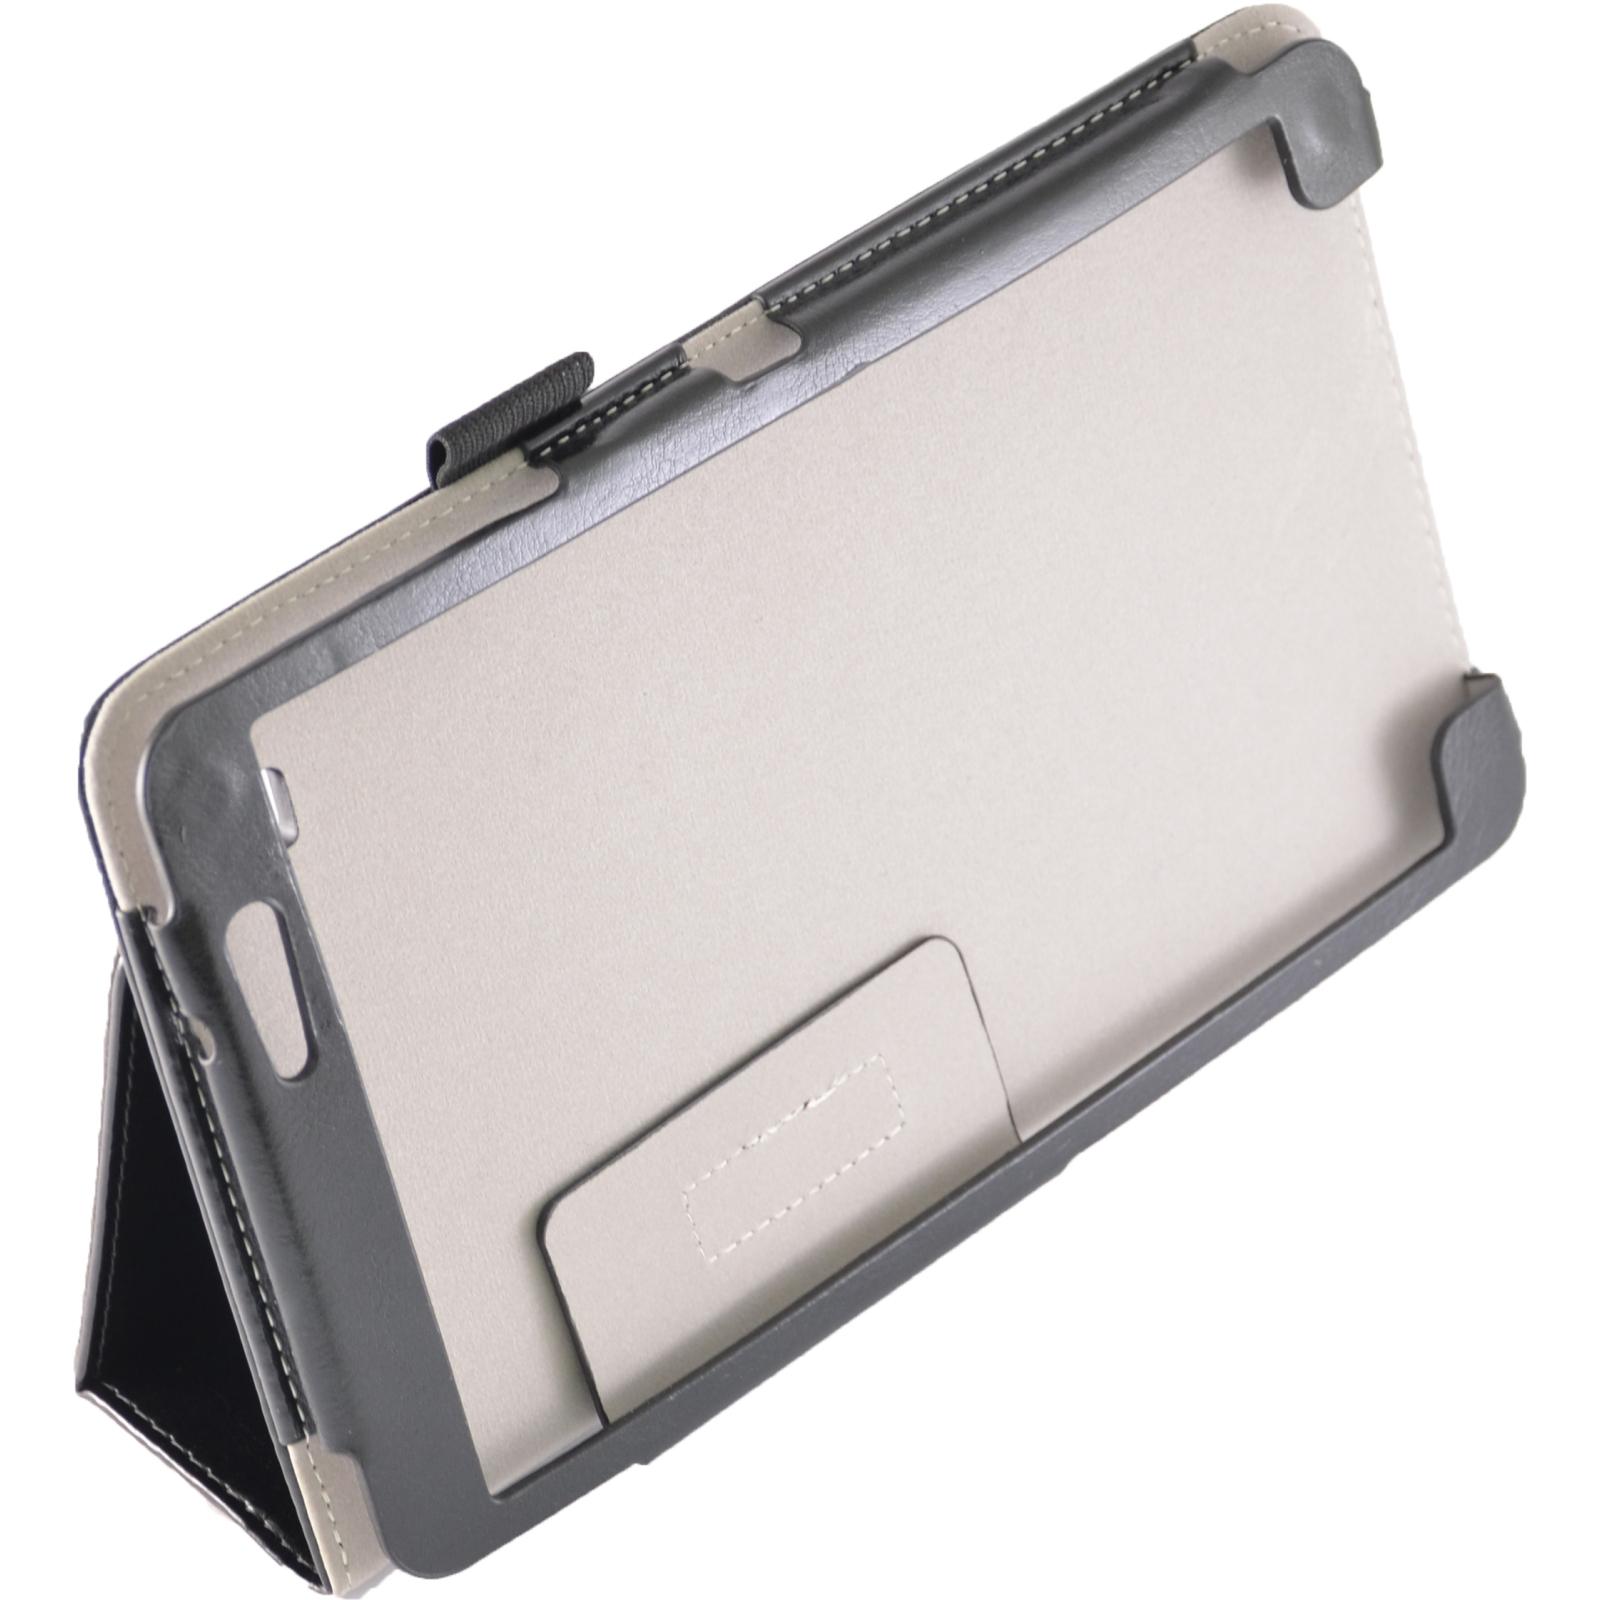 "Чехол для планшета Pro-case GALAXY Tab Pro 8.4"" T320 (Tab Pro 8.4"") изображение 3"